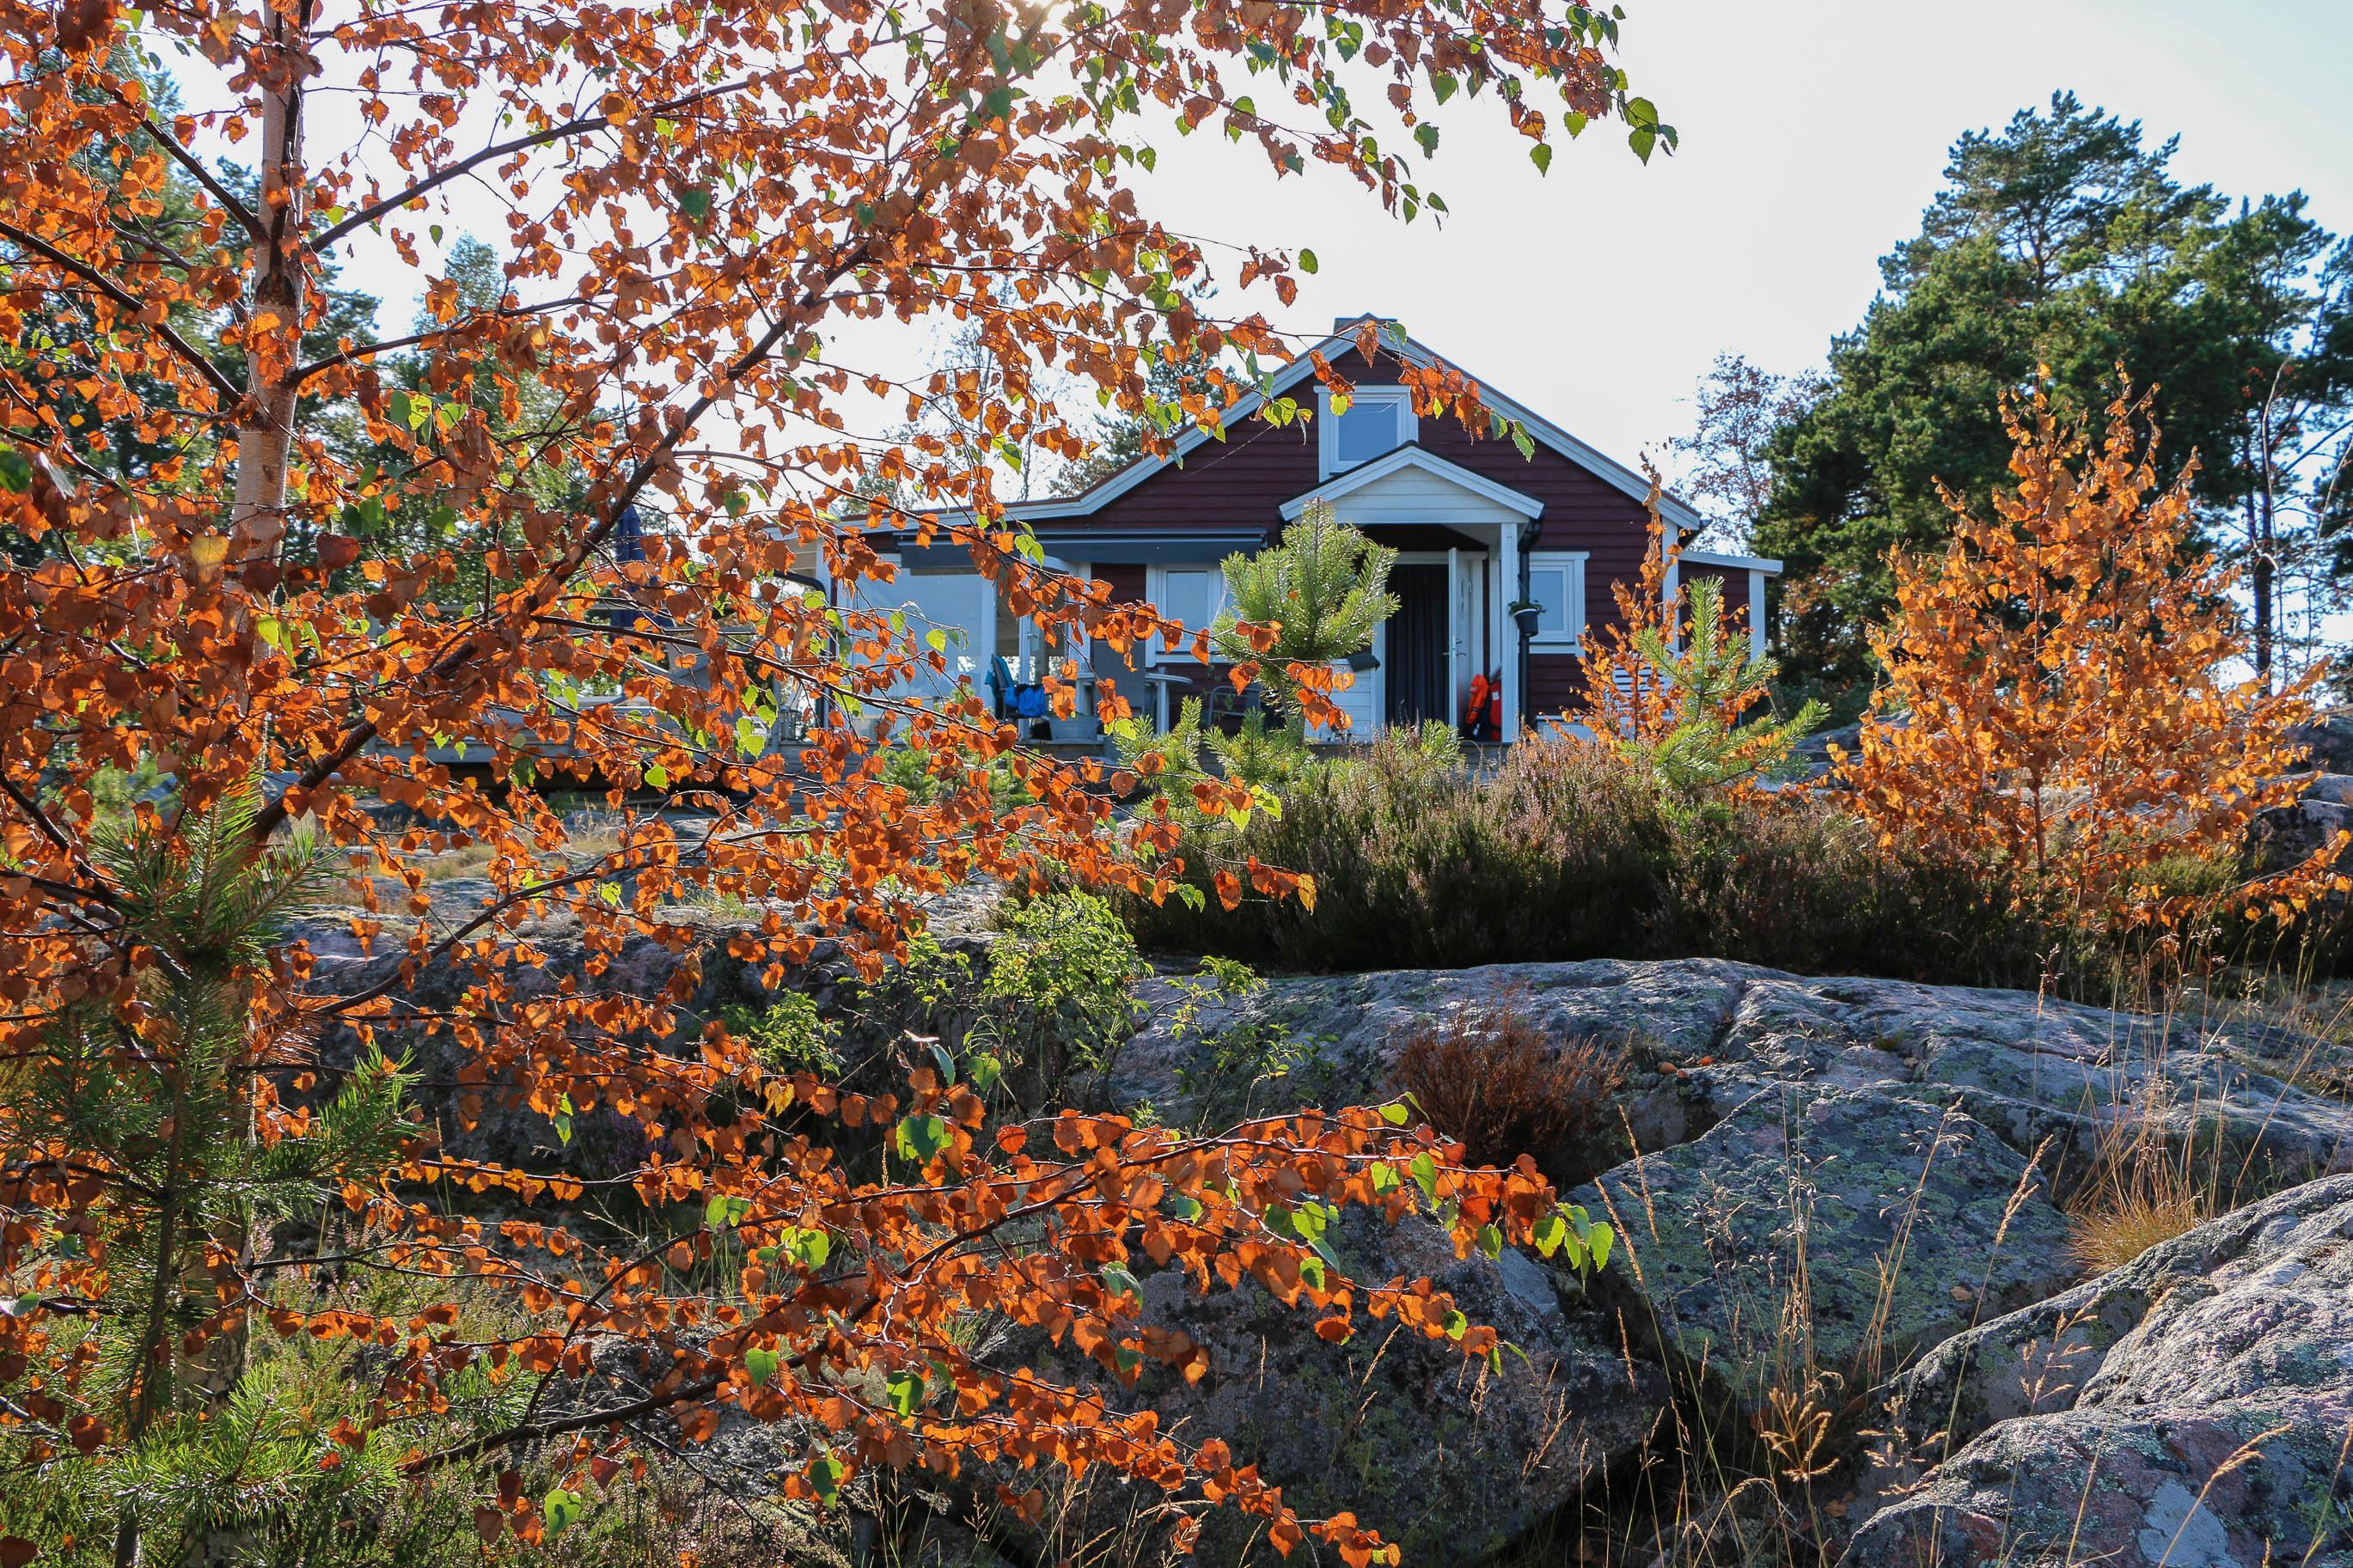 schweden private sch reninsel bei stockholm mieten. Black Bedroom Furniture Sets. Home Design Ideas